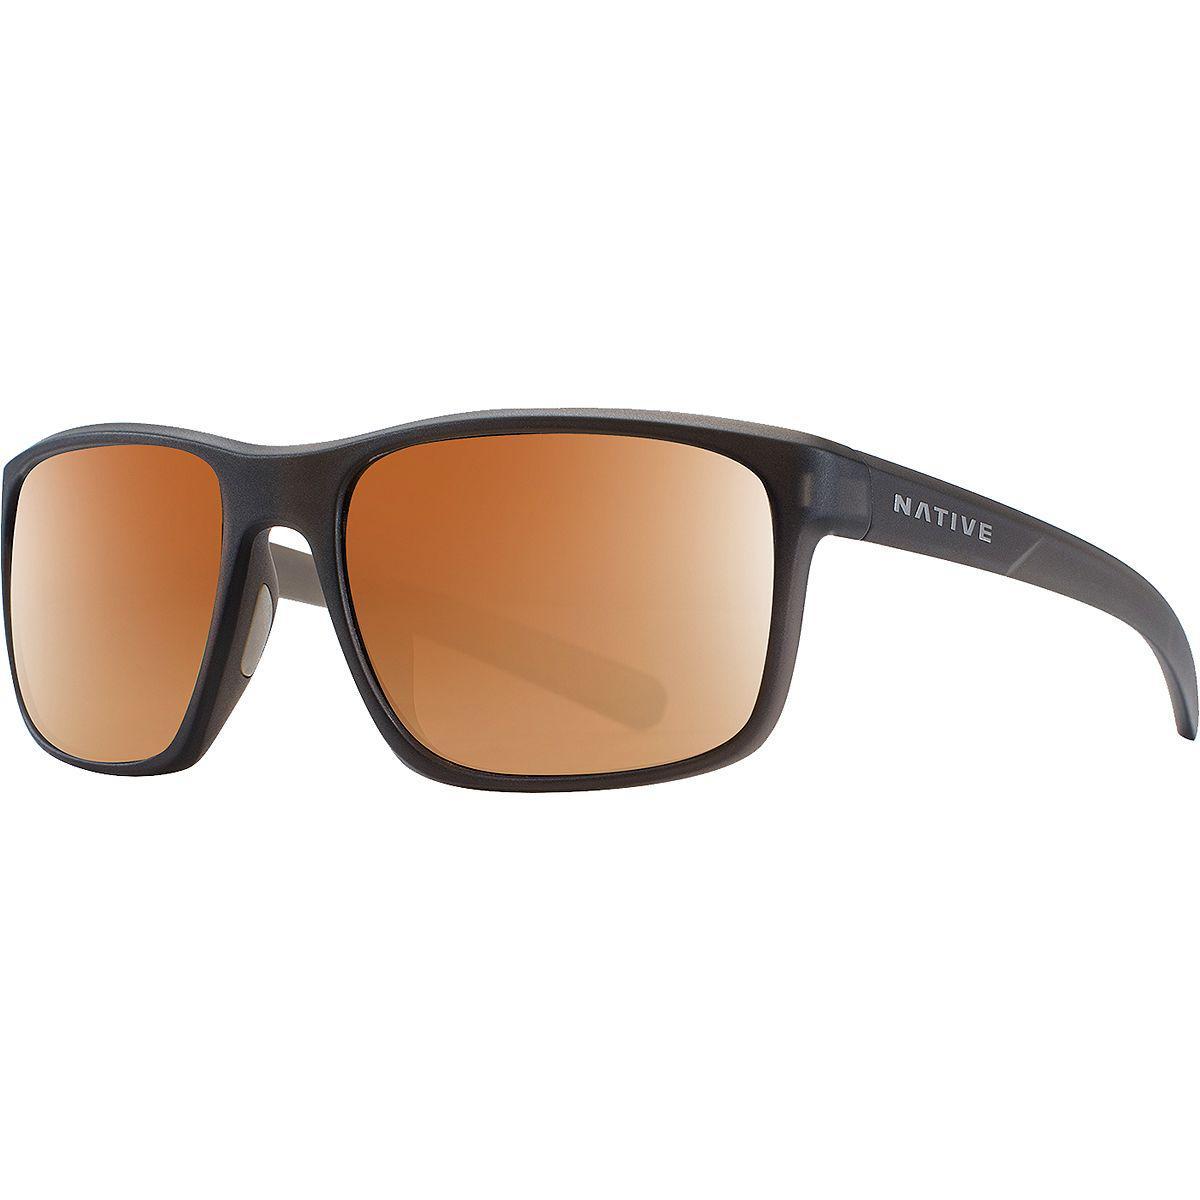 833823285e Lyst - Native Eyewear Wells Polarized Sunglasses in Brown for Men